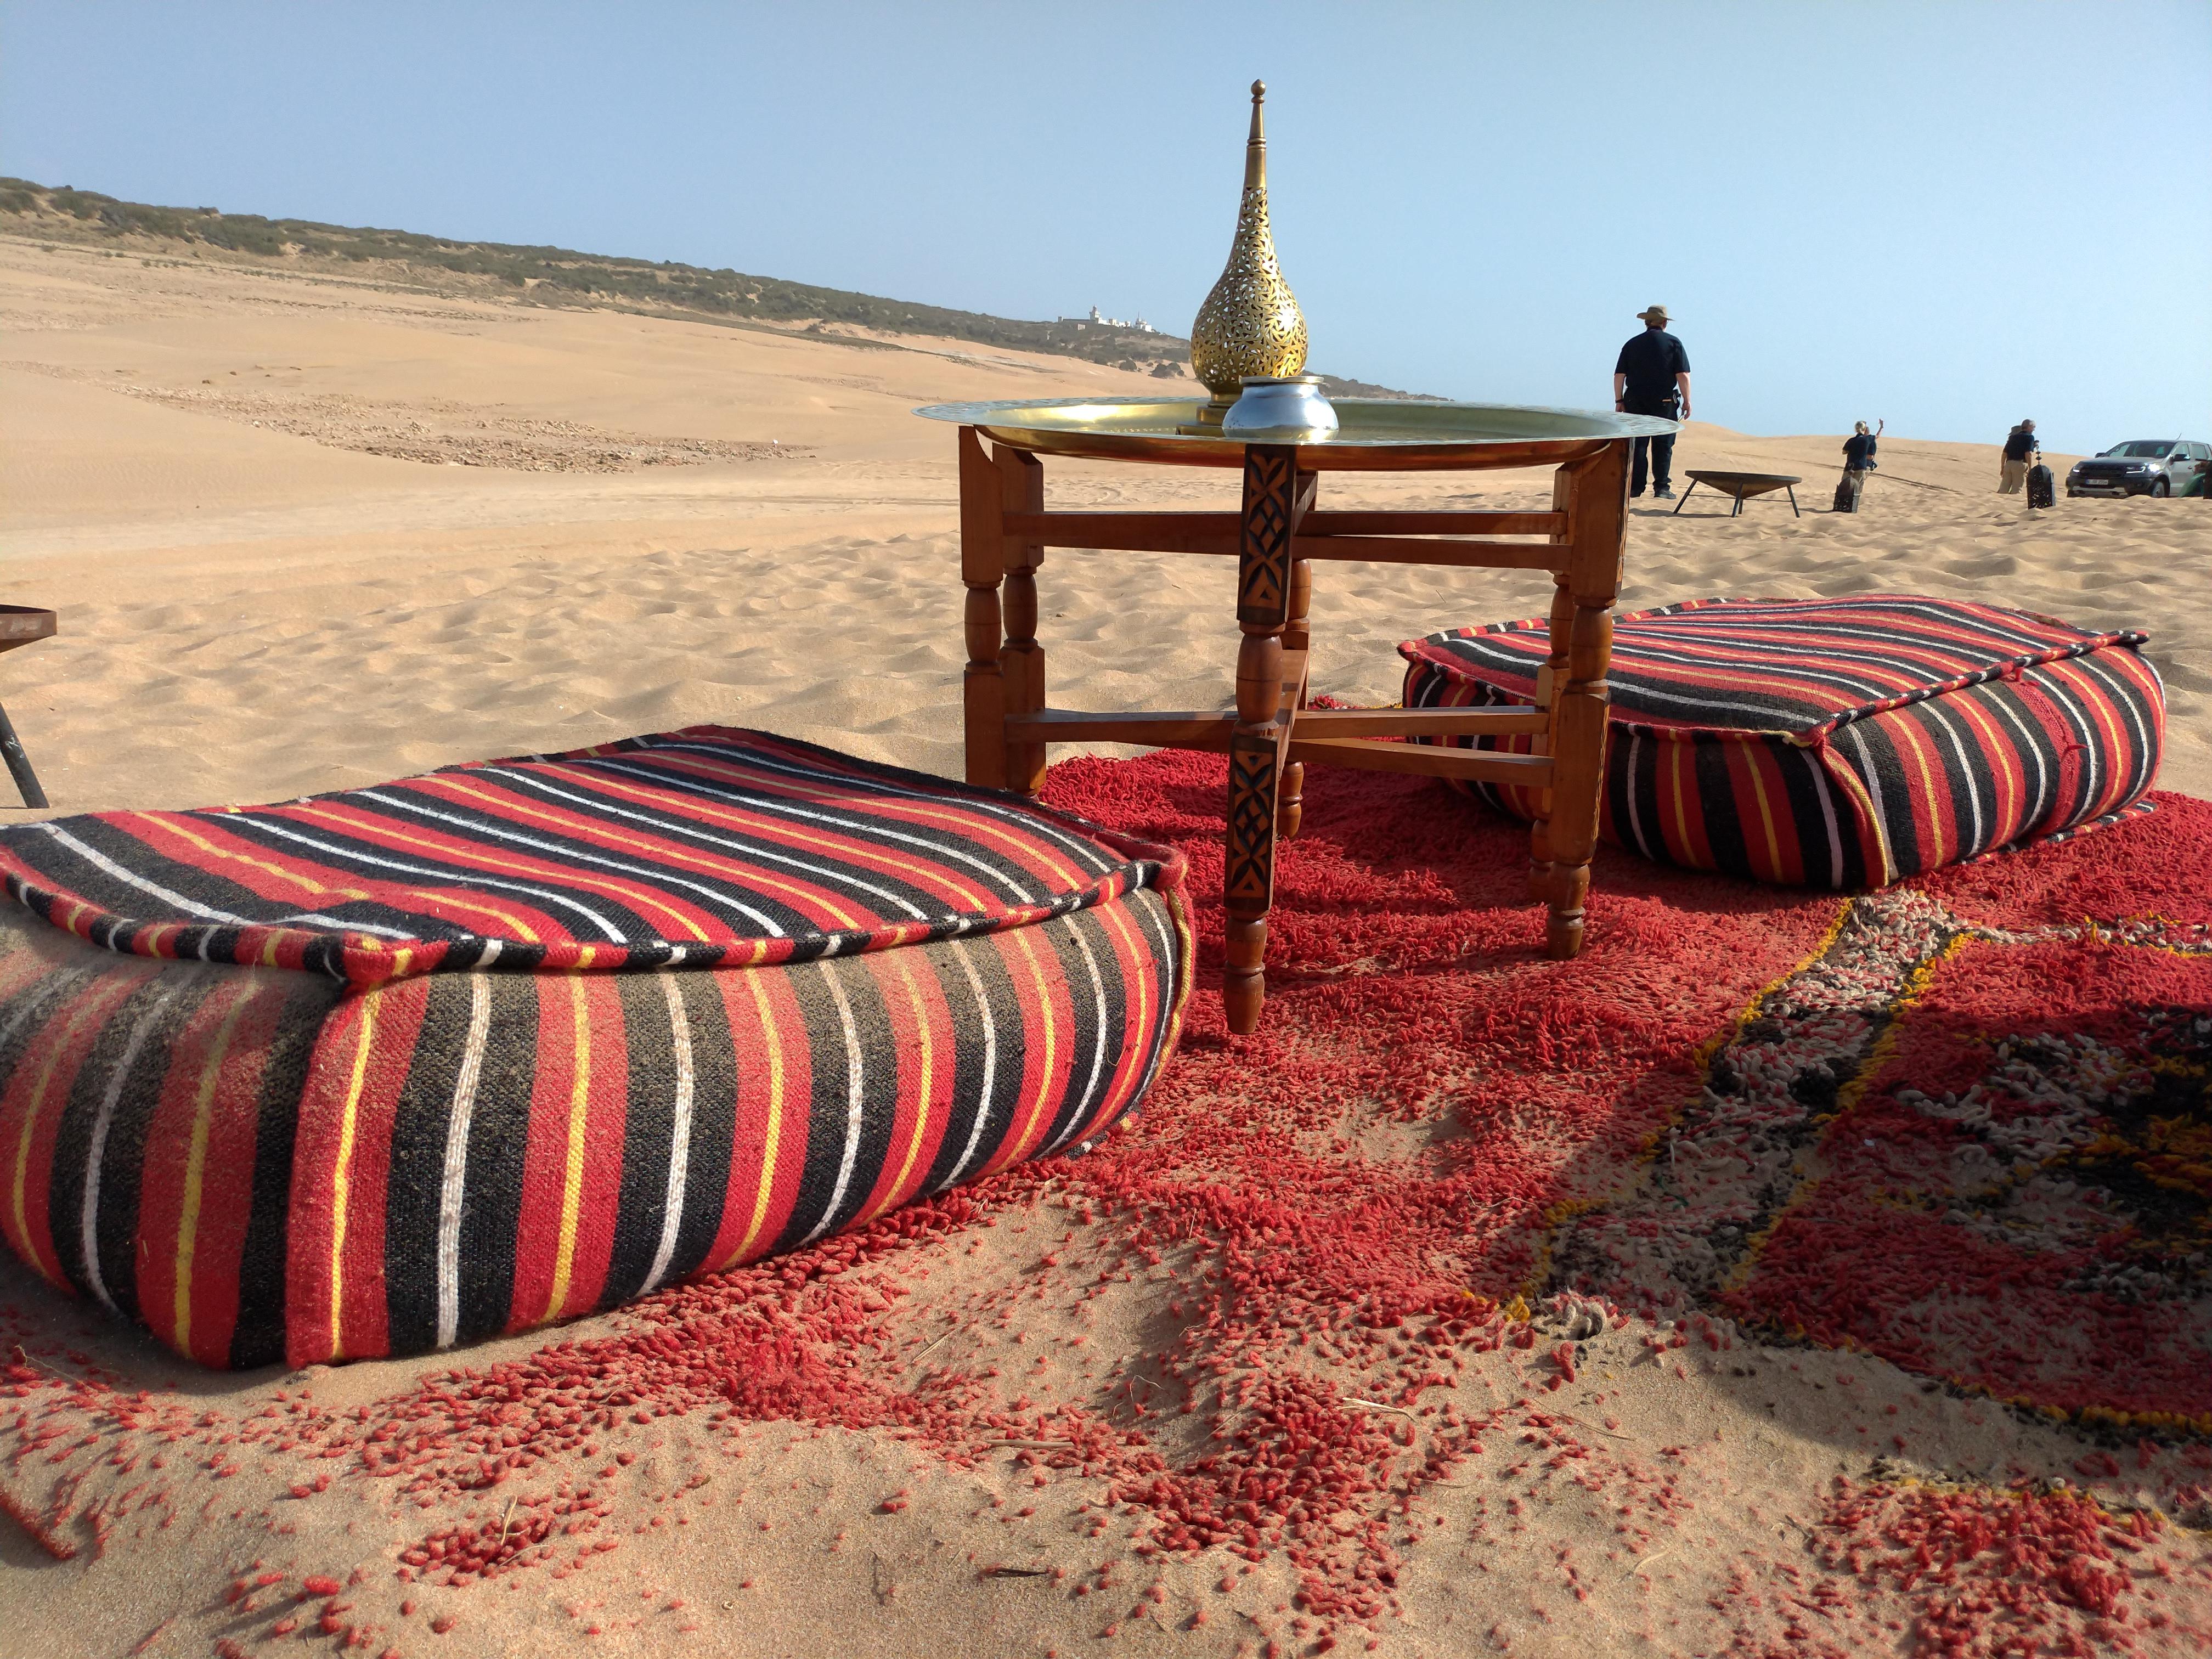 Moroccan bivouac